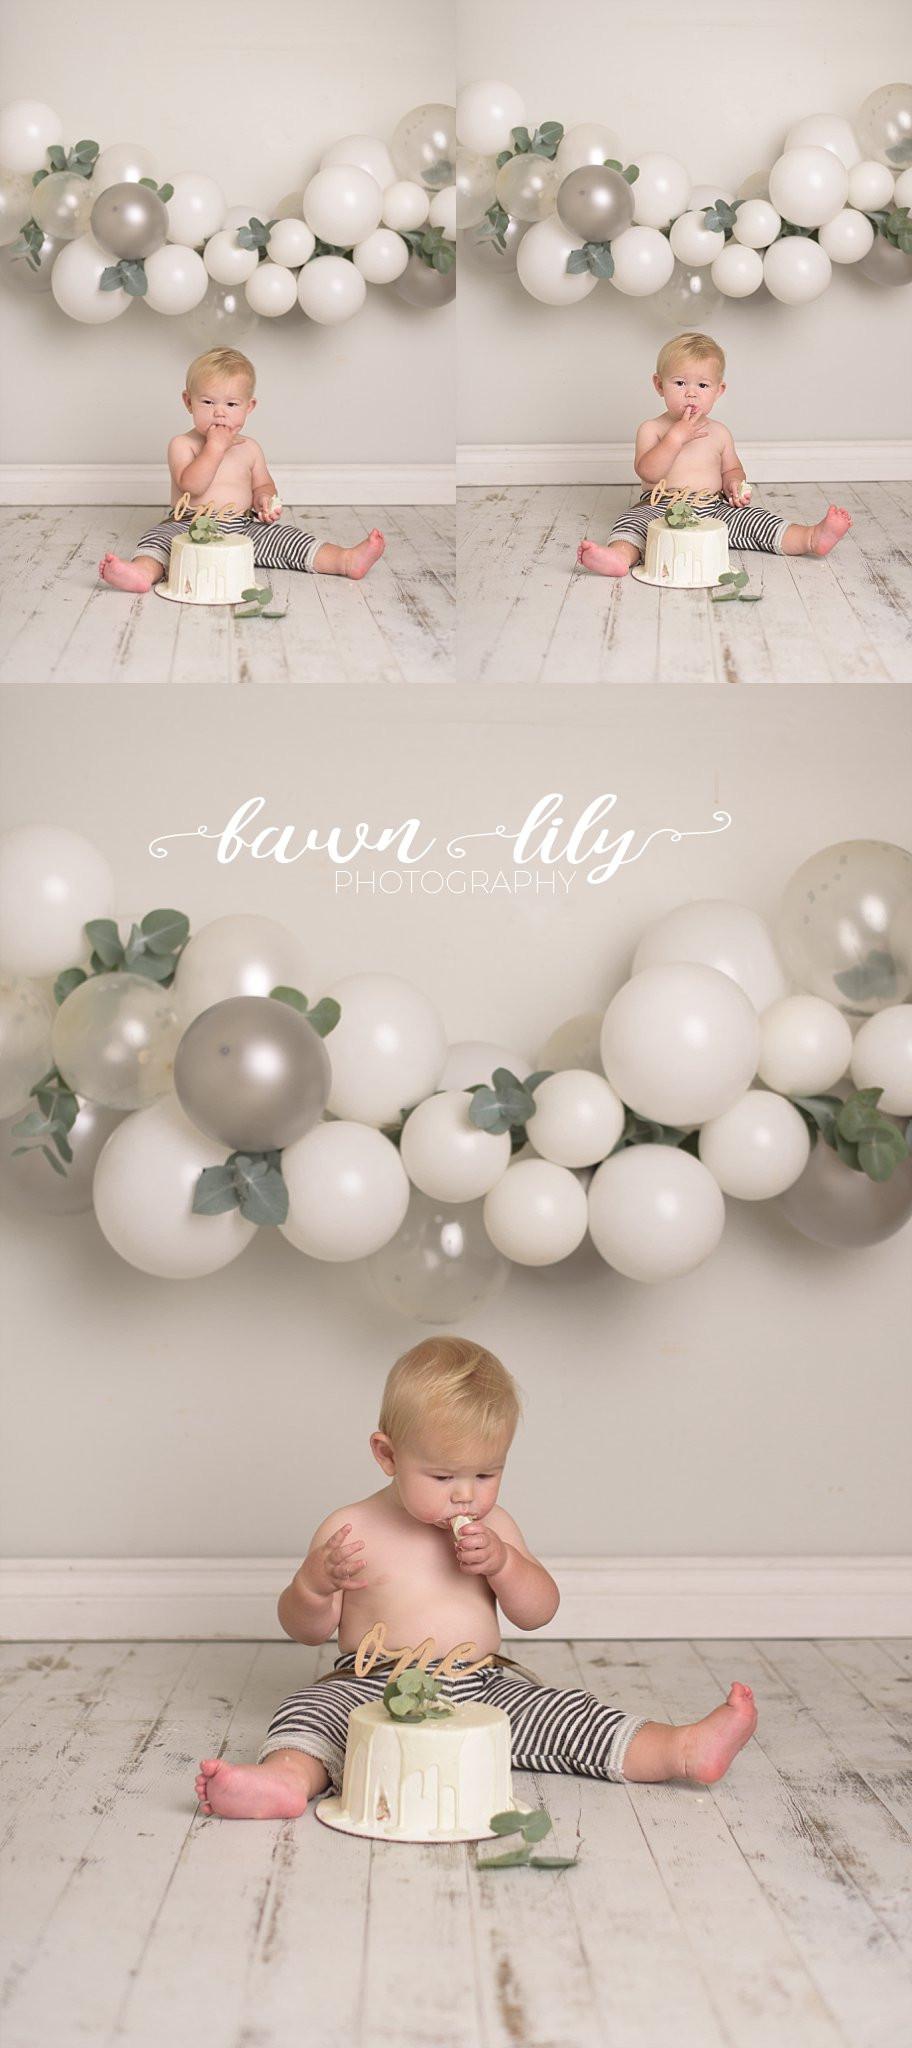 Victoria BC Cake Smash, Baby Photographer, Victoria BC, Fawn Lily Photographer, Balloon Garland